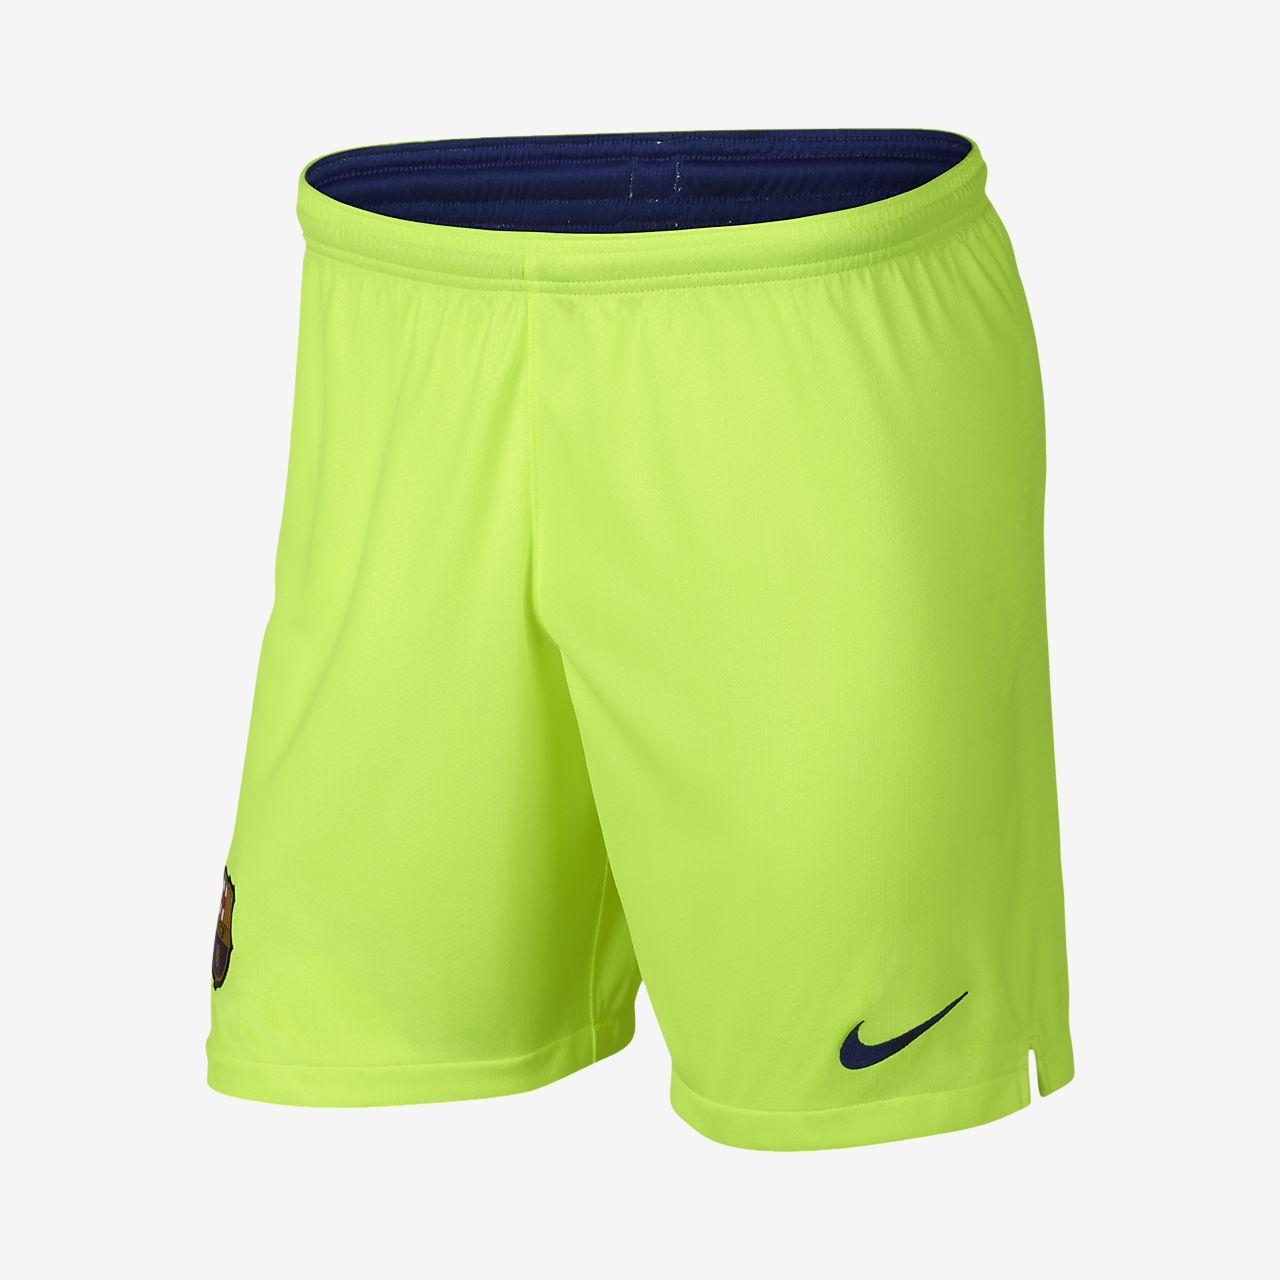 c0f5df3a876a9 ... Shorts de fútbol para hombre de visitante Stadium del FC Barcelona  2018 19